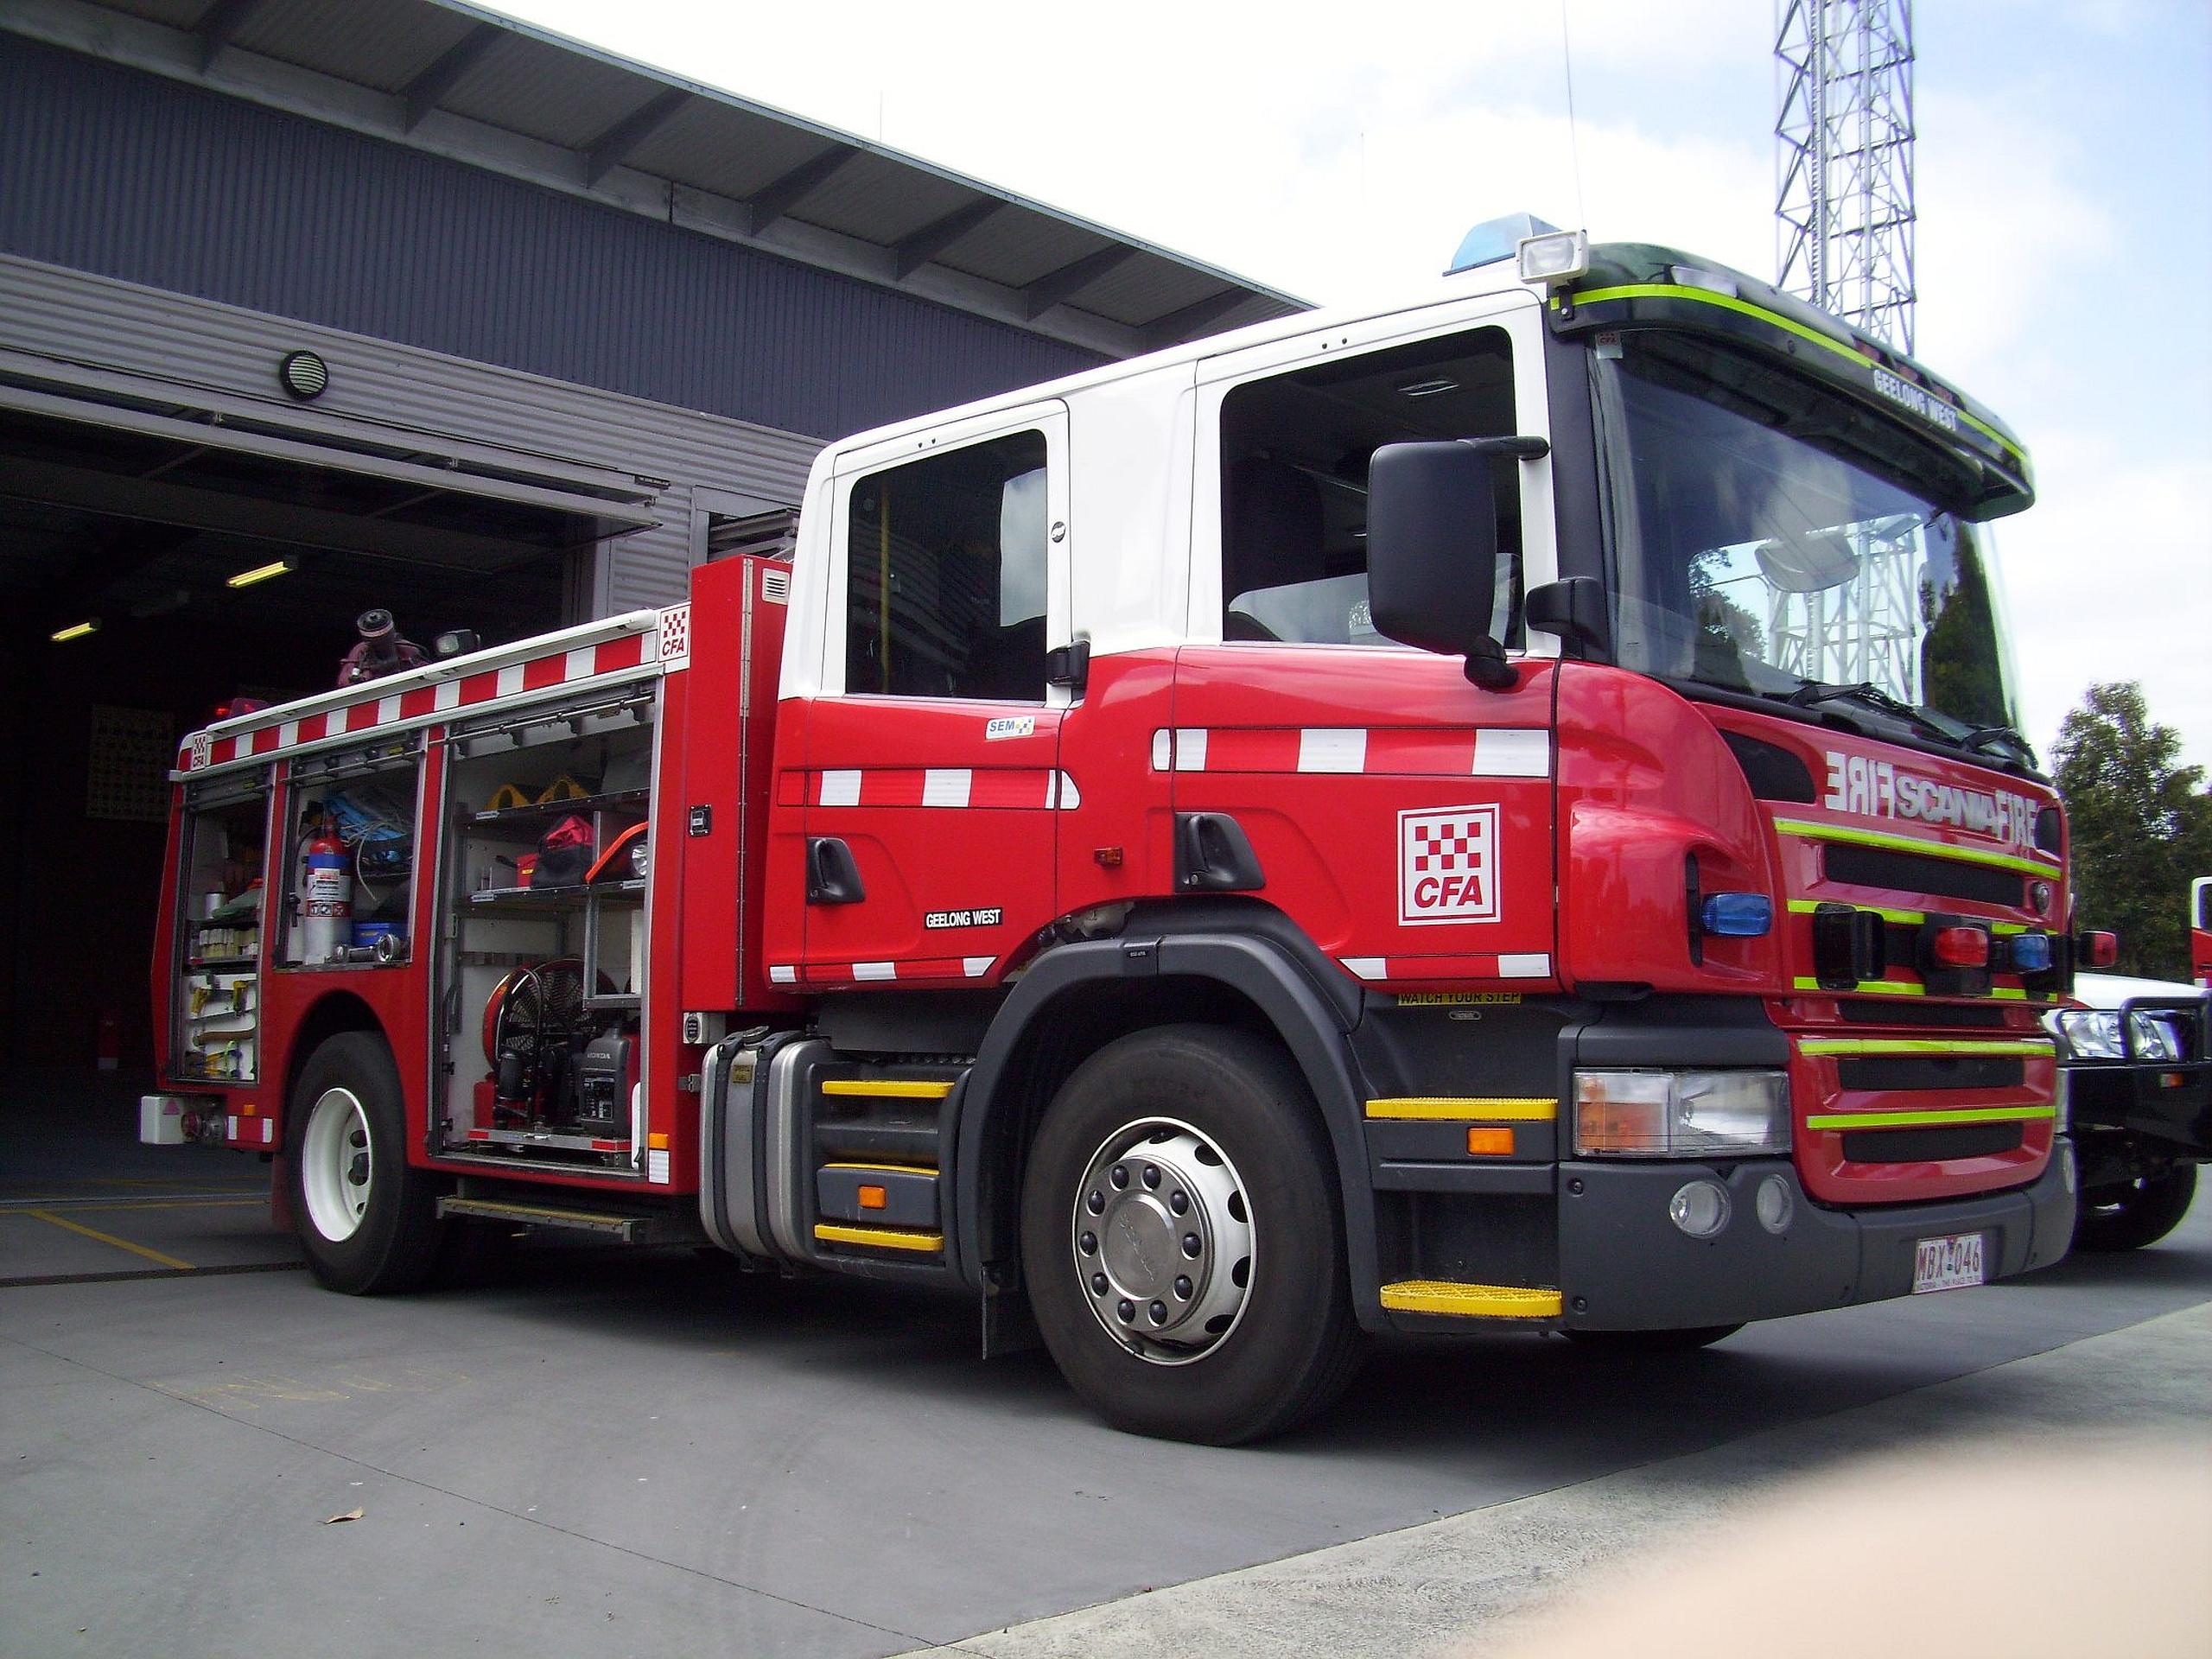 Scania Fire Truck Wallpaper Cfa Scania Fire Truck